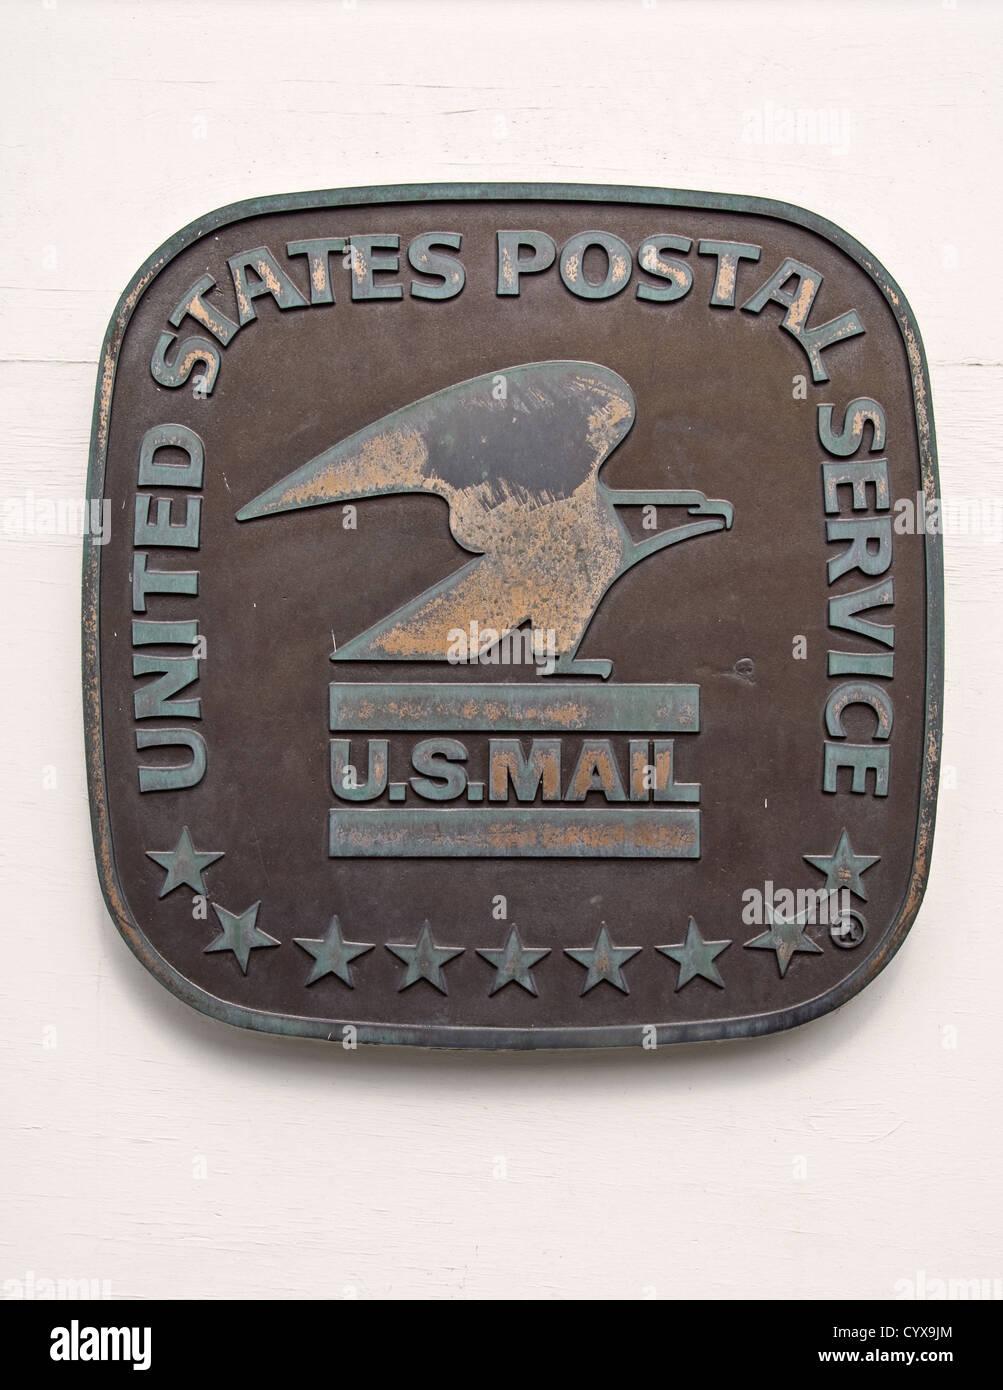 United states postal service - US mail bronze sign - Stock Image